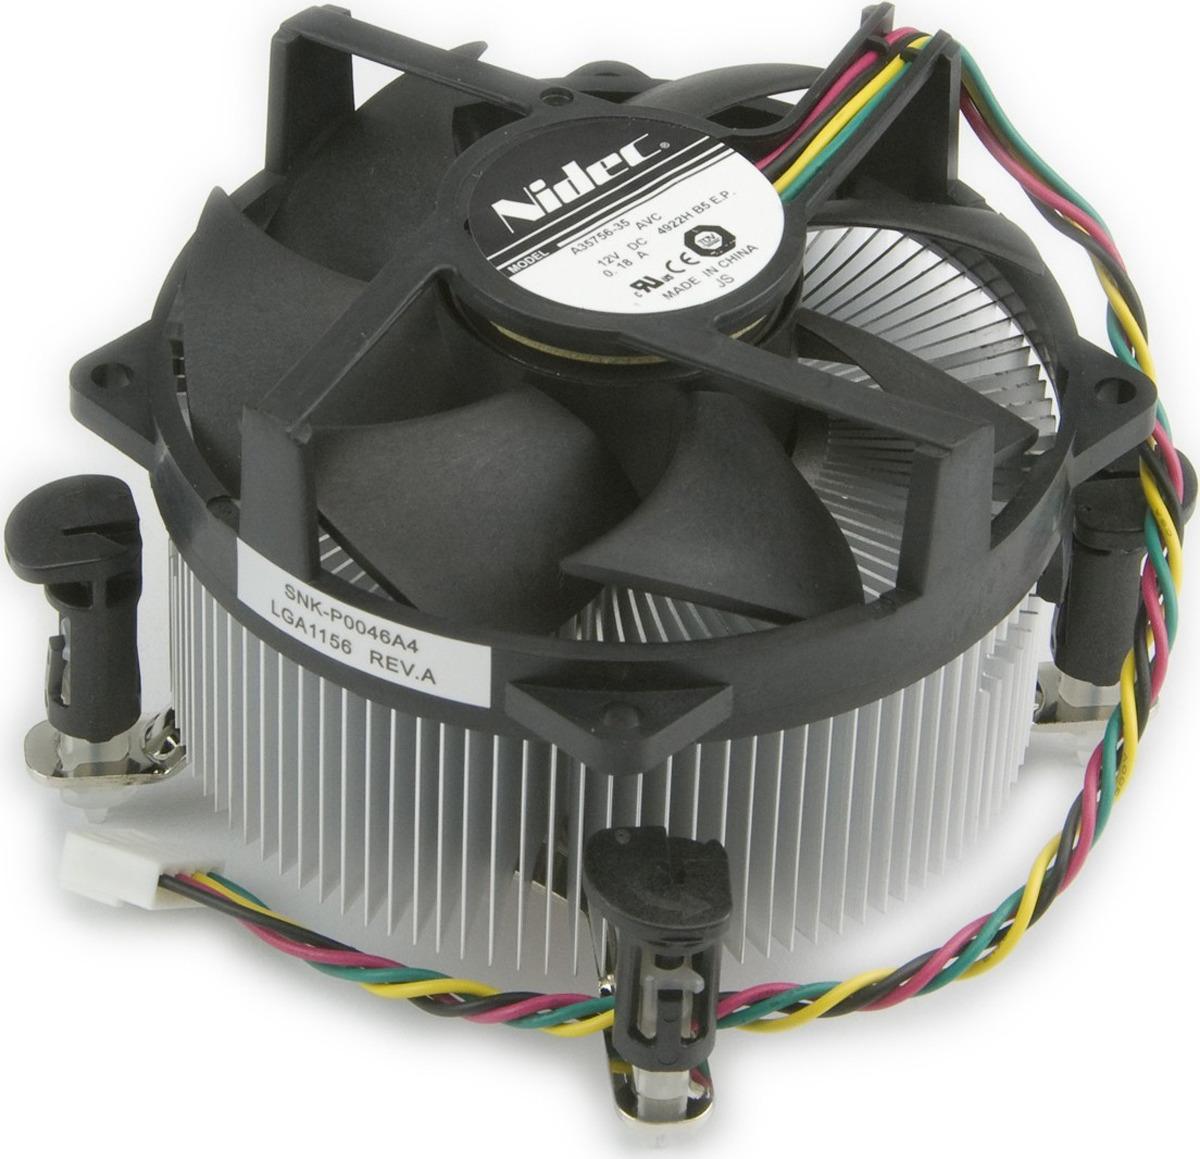 Радиатор SuperMicro SNK-P0046A4 2U Active Soc-1156 seiko snk